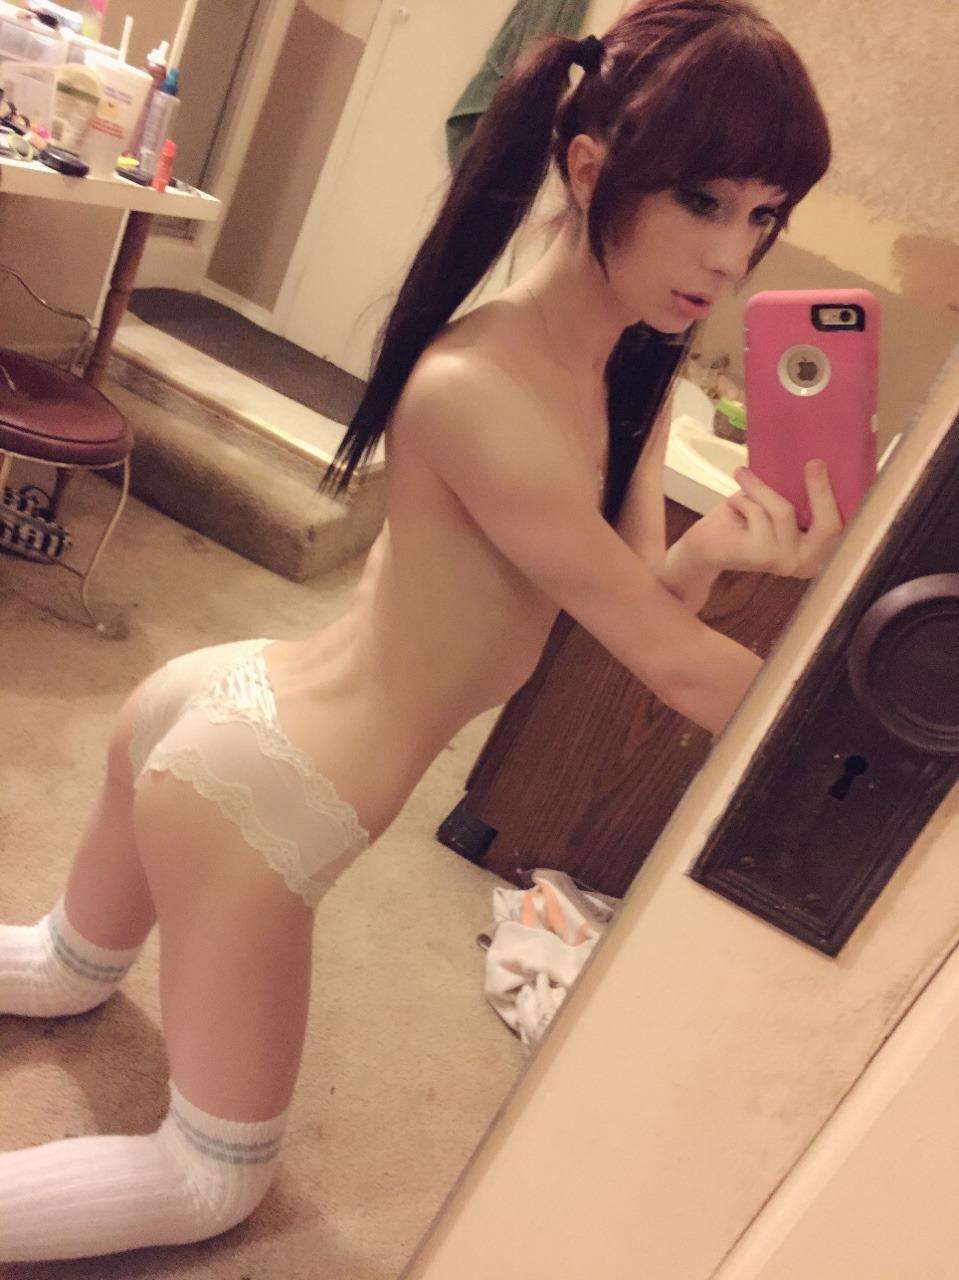 best black white nudes images on pinterest beautiful women